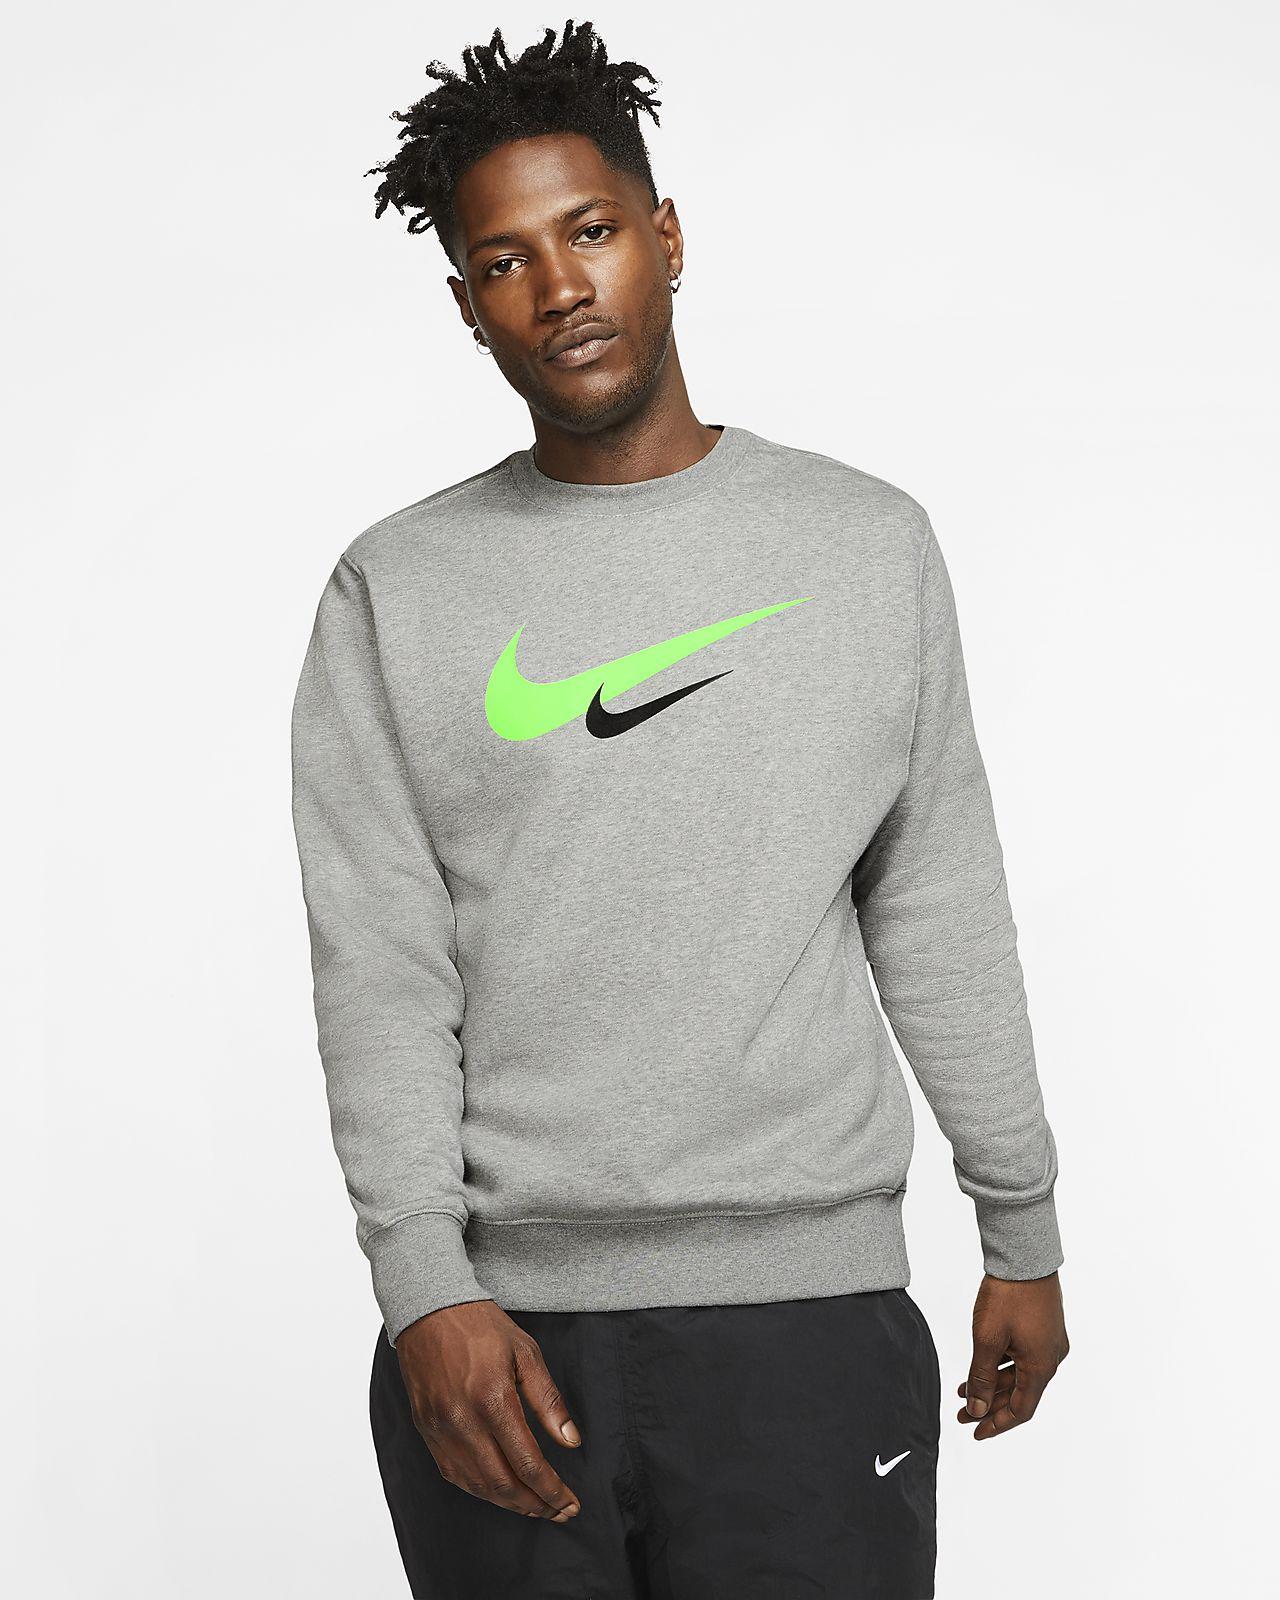 Nike Sportswear Herenshirt met ronde hals en Swoosh